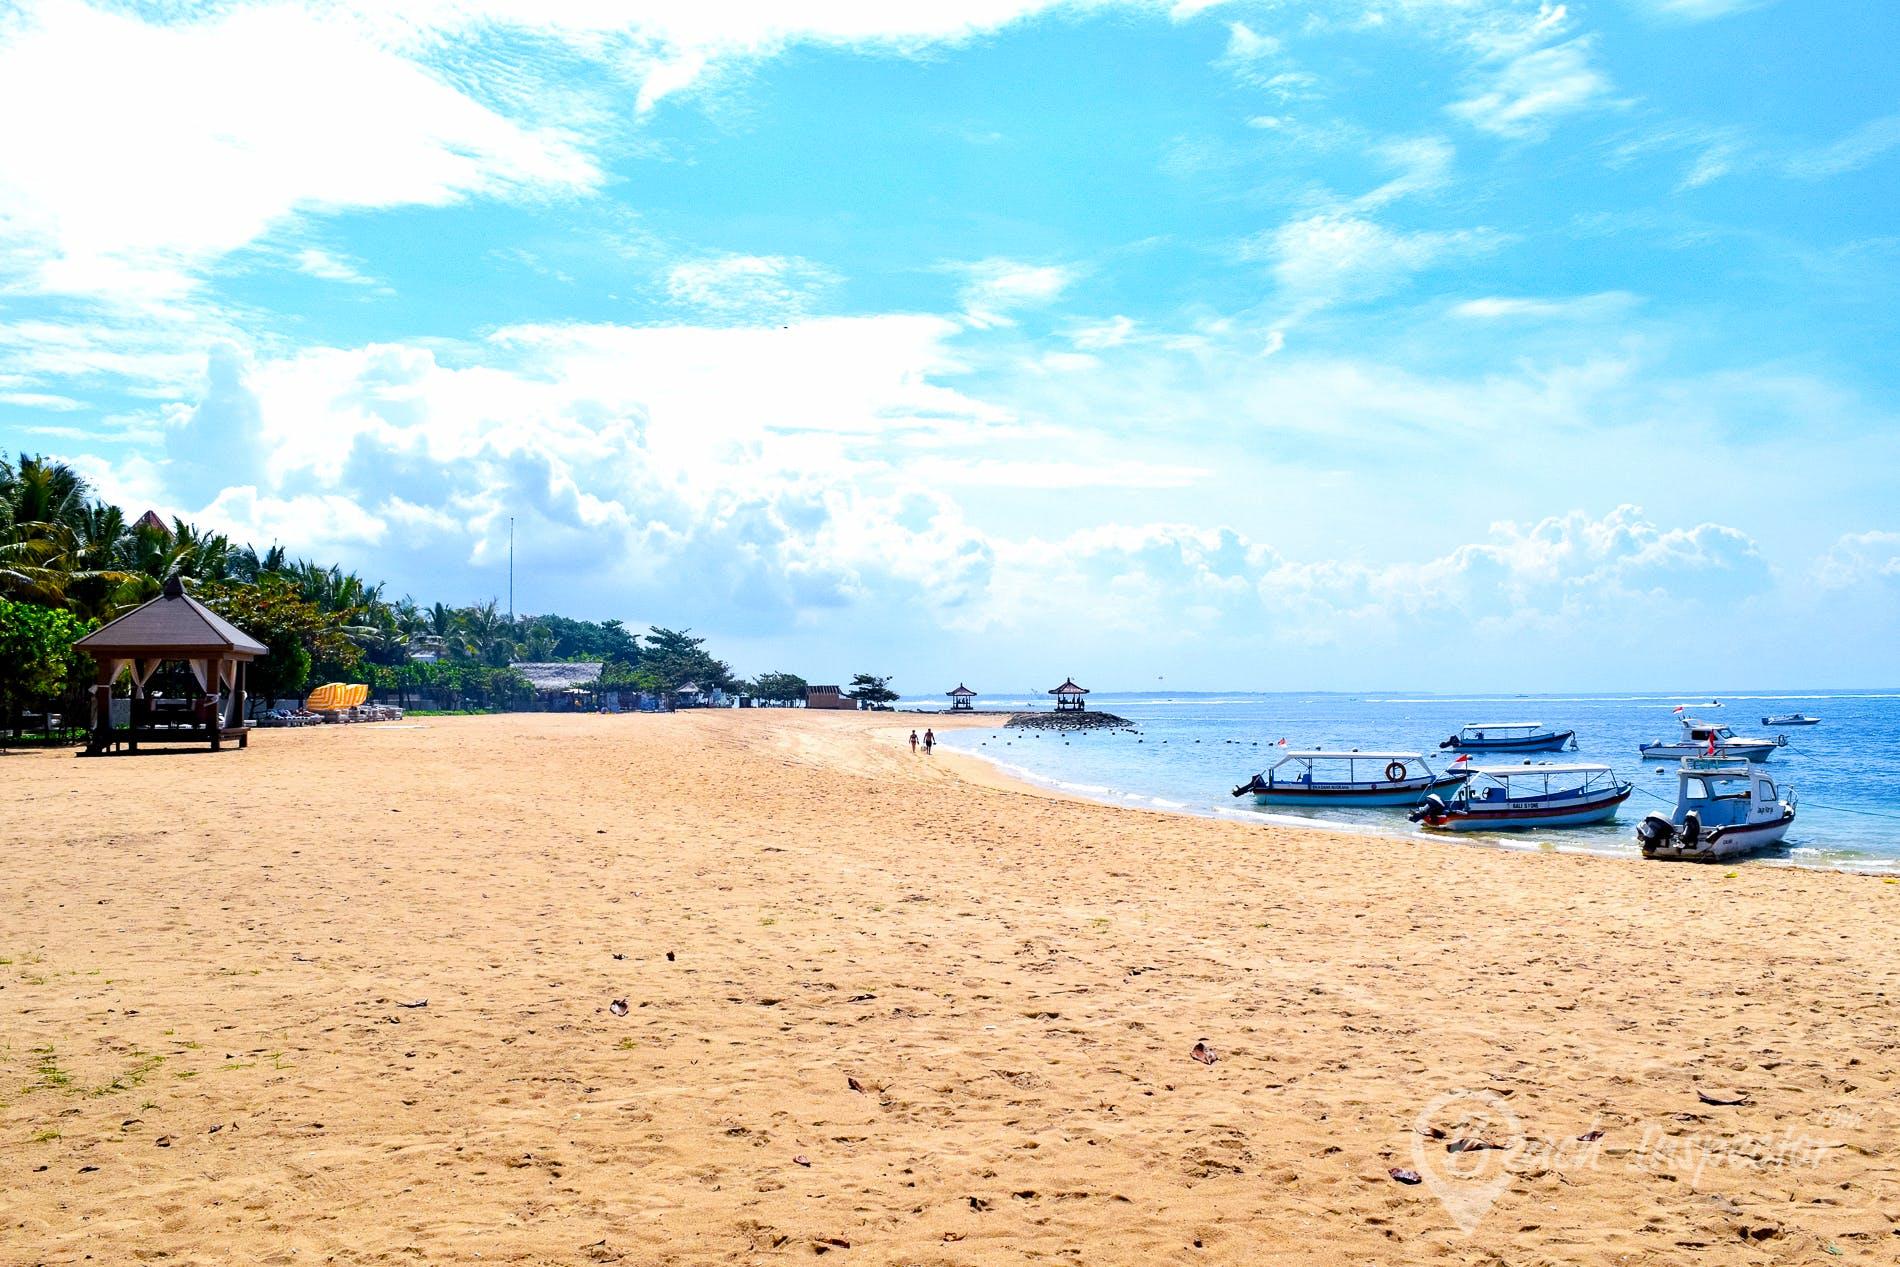 Beach Benoa Beach, Bali, Indonesia